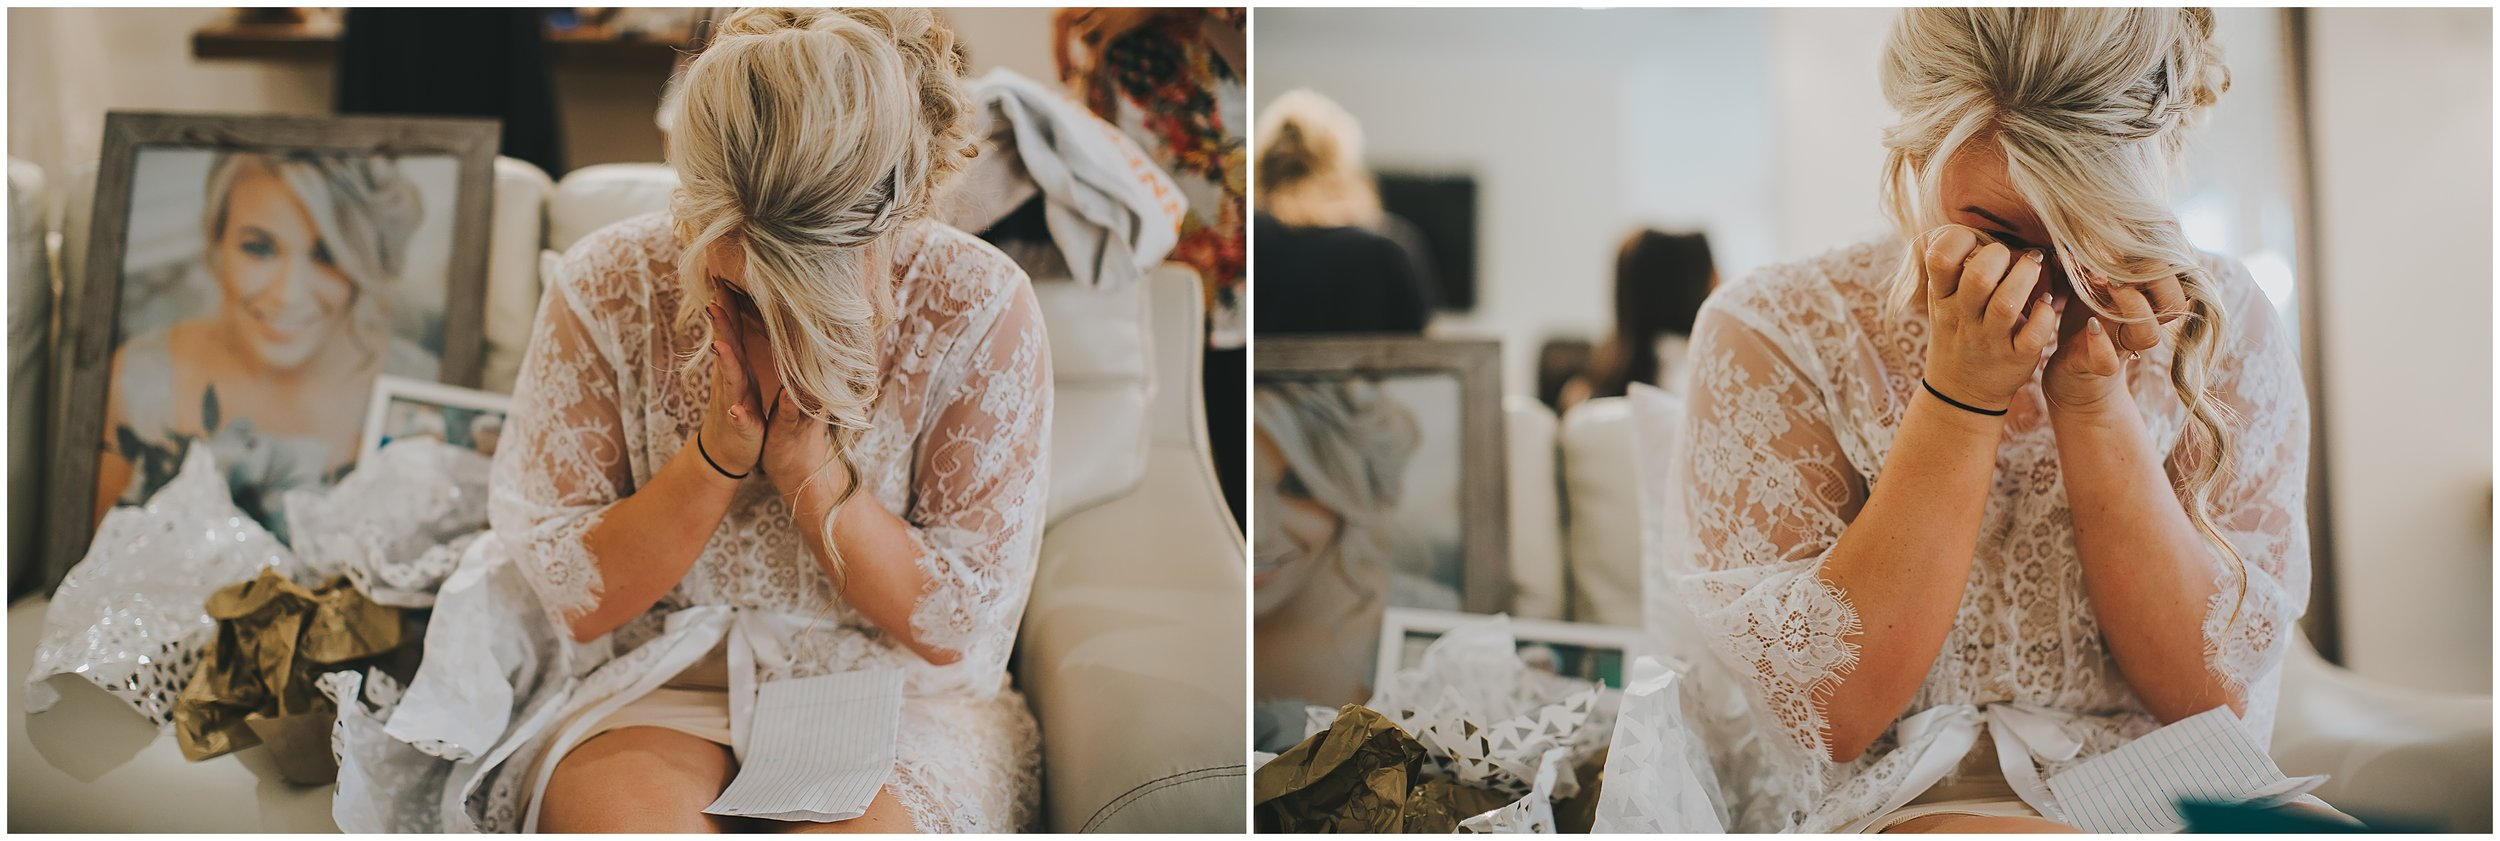 Charlotte NC wedding photographer_0348.jpg